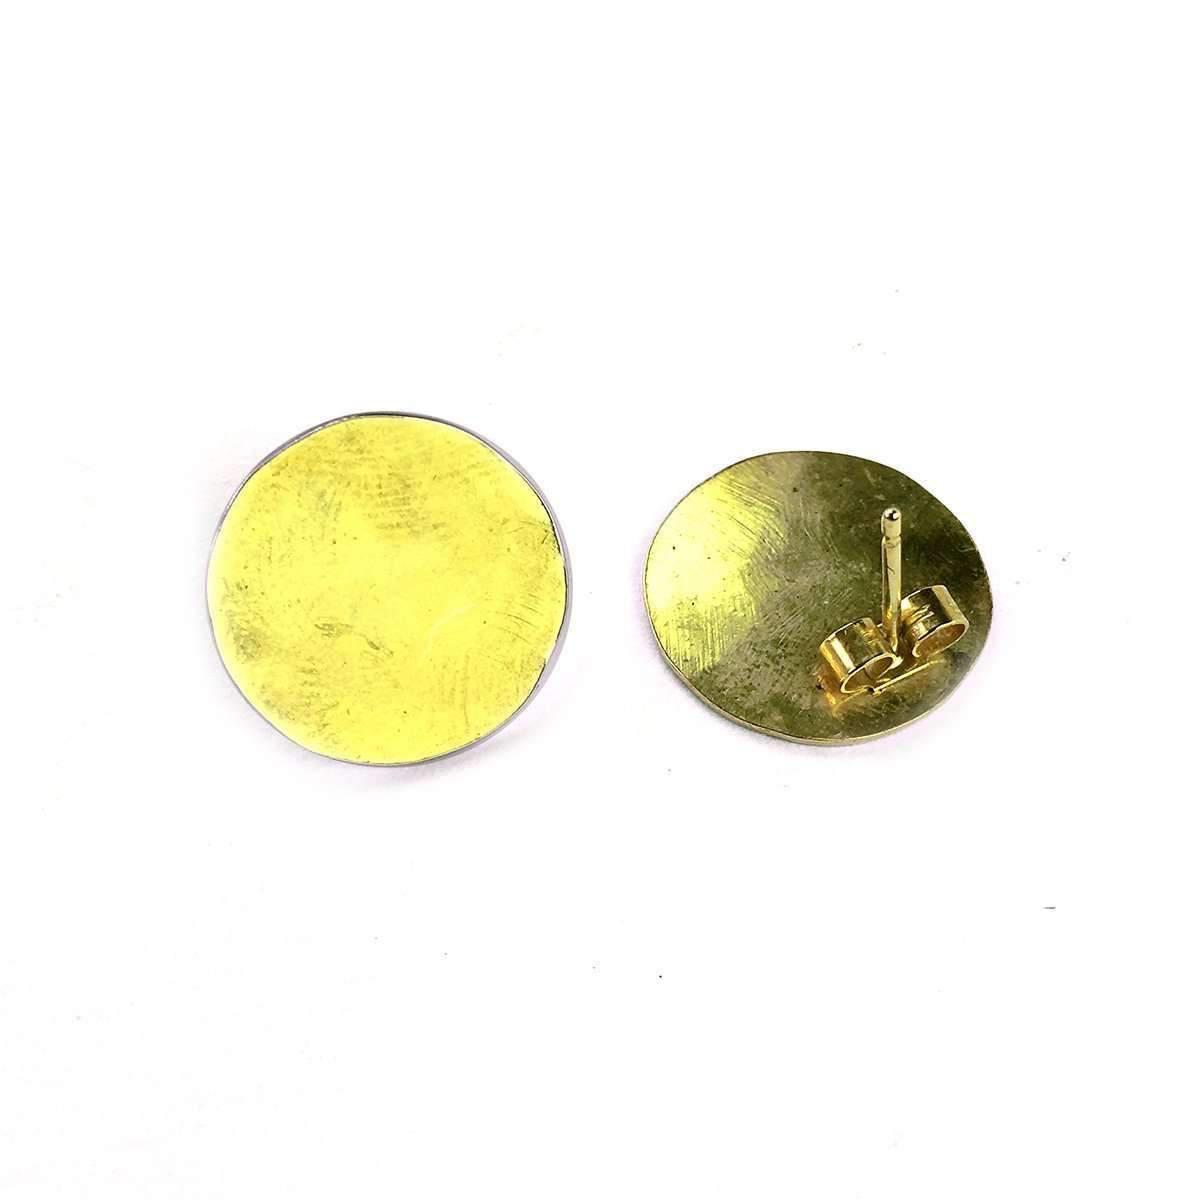 Fran Regan Jewellery Small Vermeil Discus Studs Euyi2